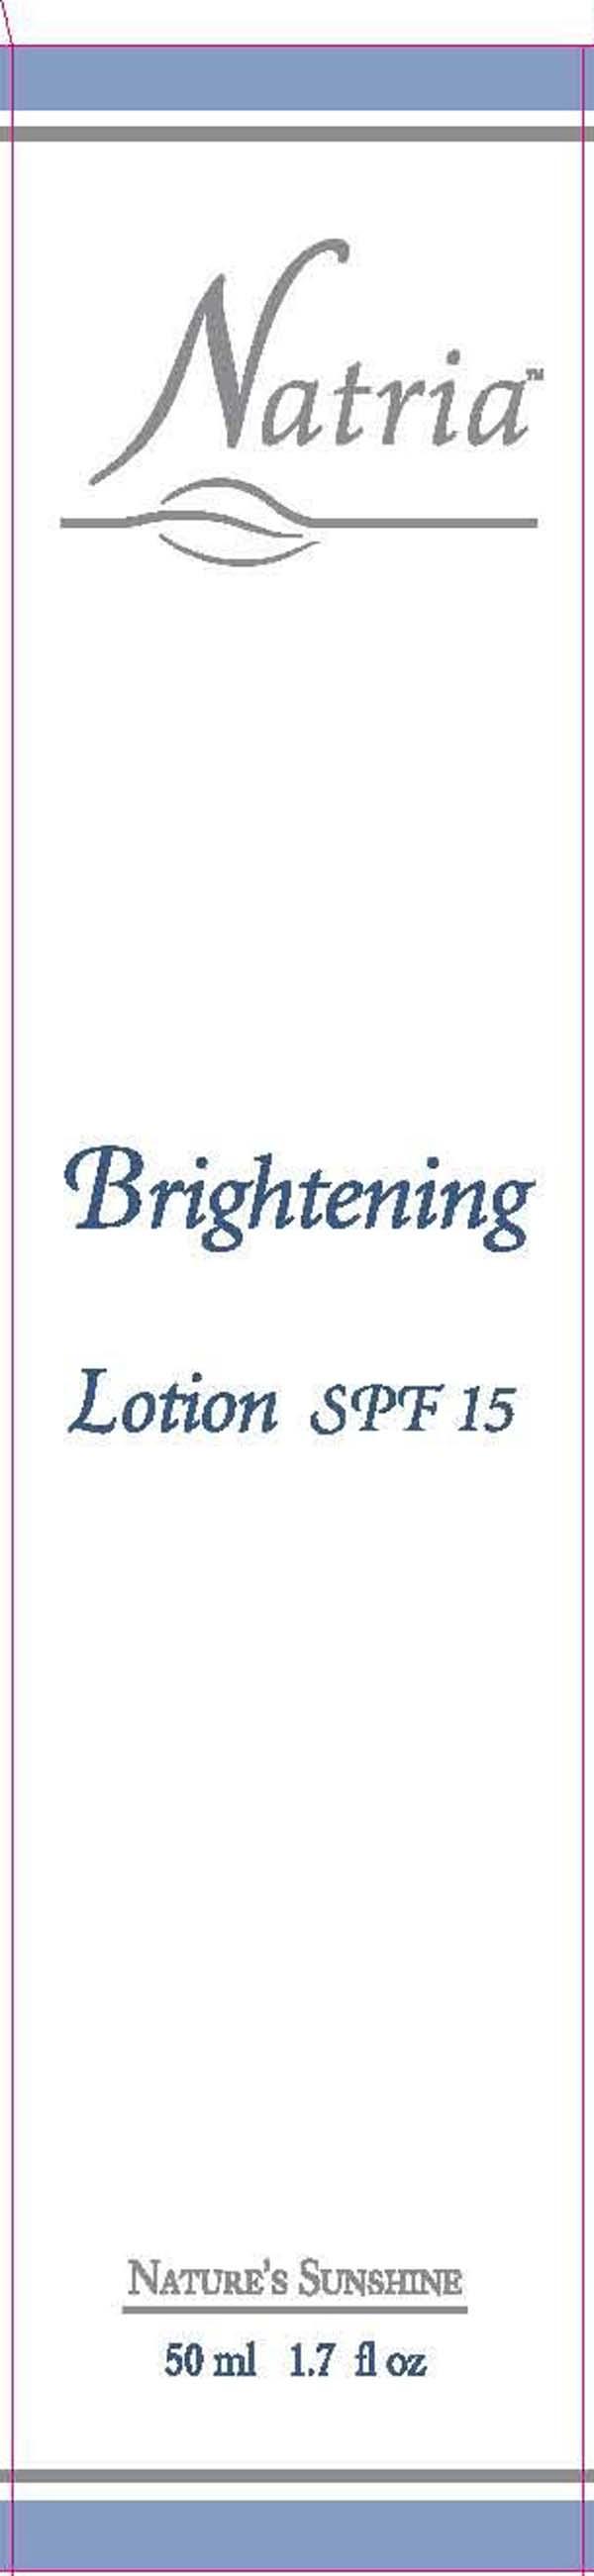 Natria Brightening Spf 15 (Ethylhexl Methoxycinnamate, Zinc Oxide) Cream [Wasatch Product Development]